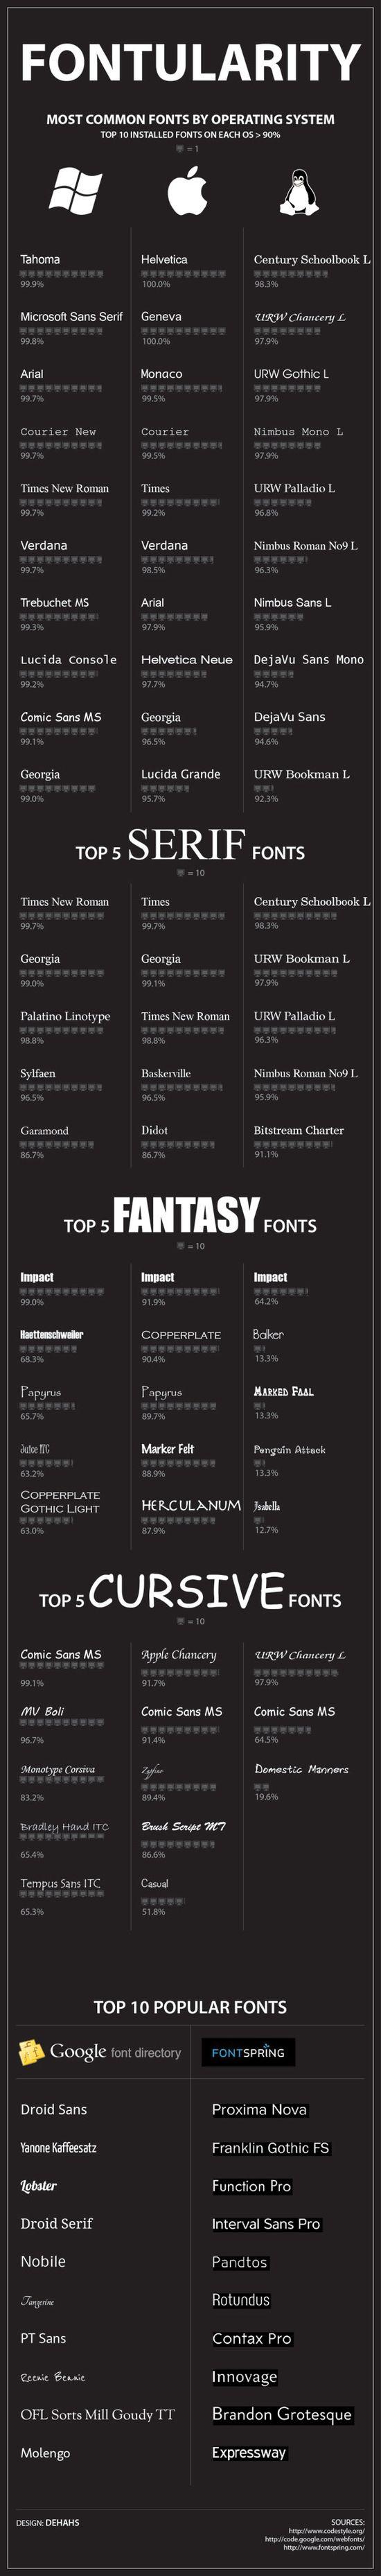 Fontularity: Most Po